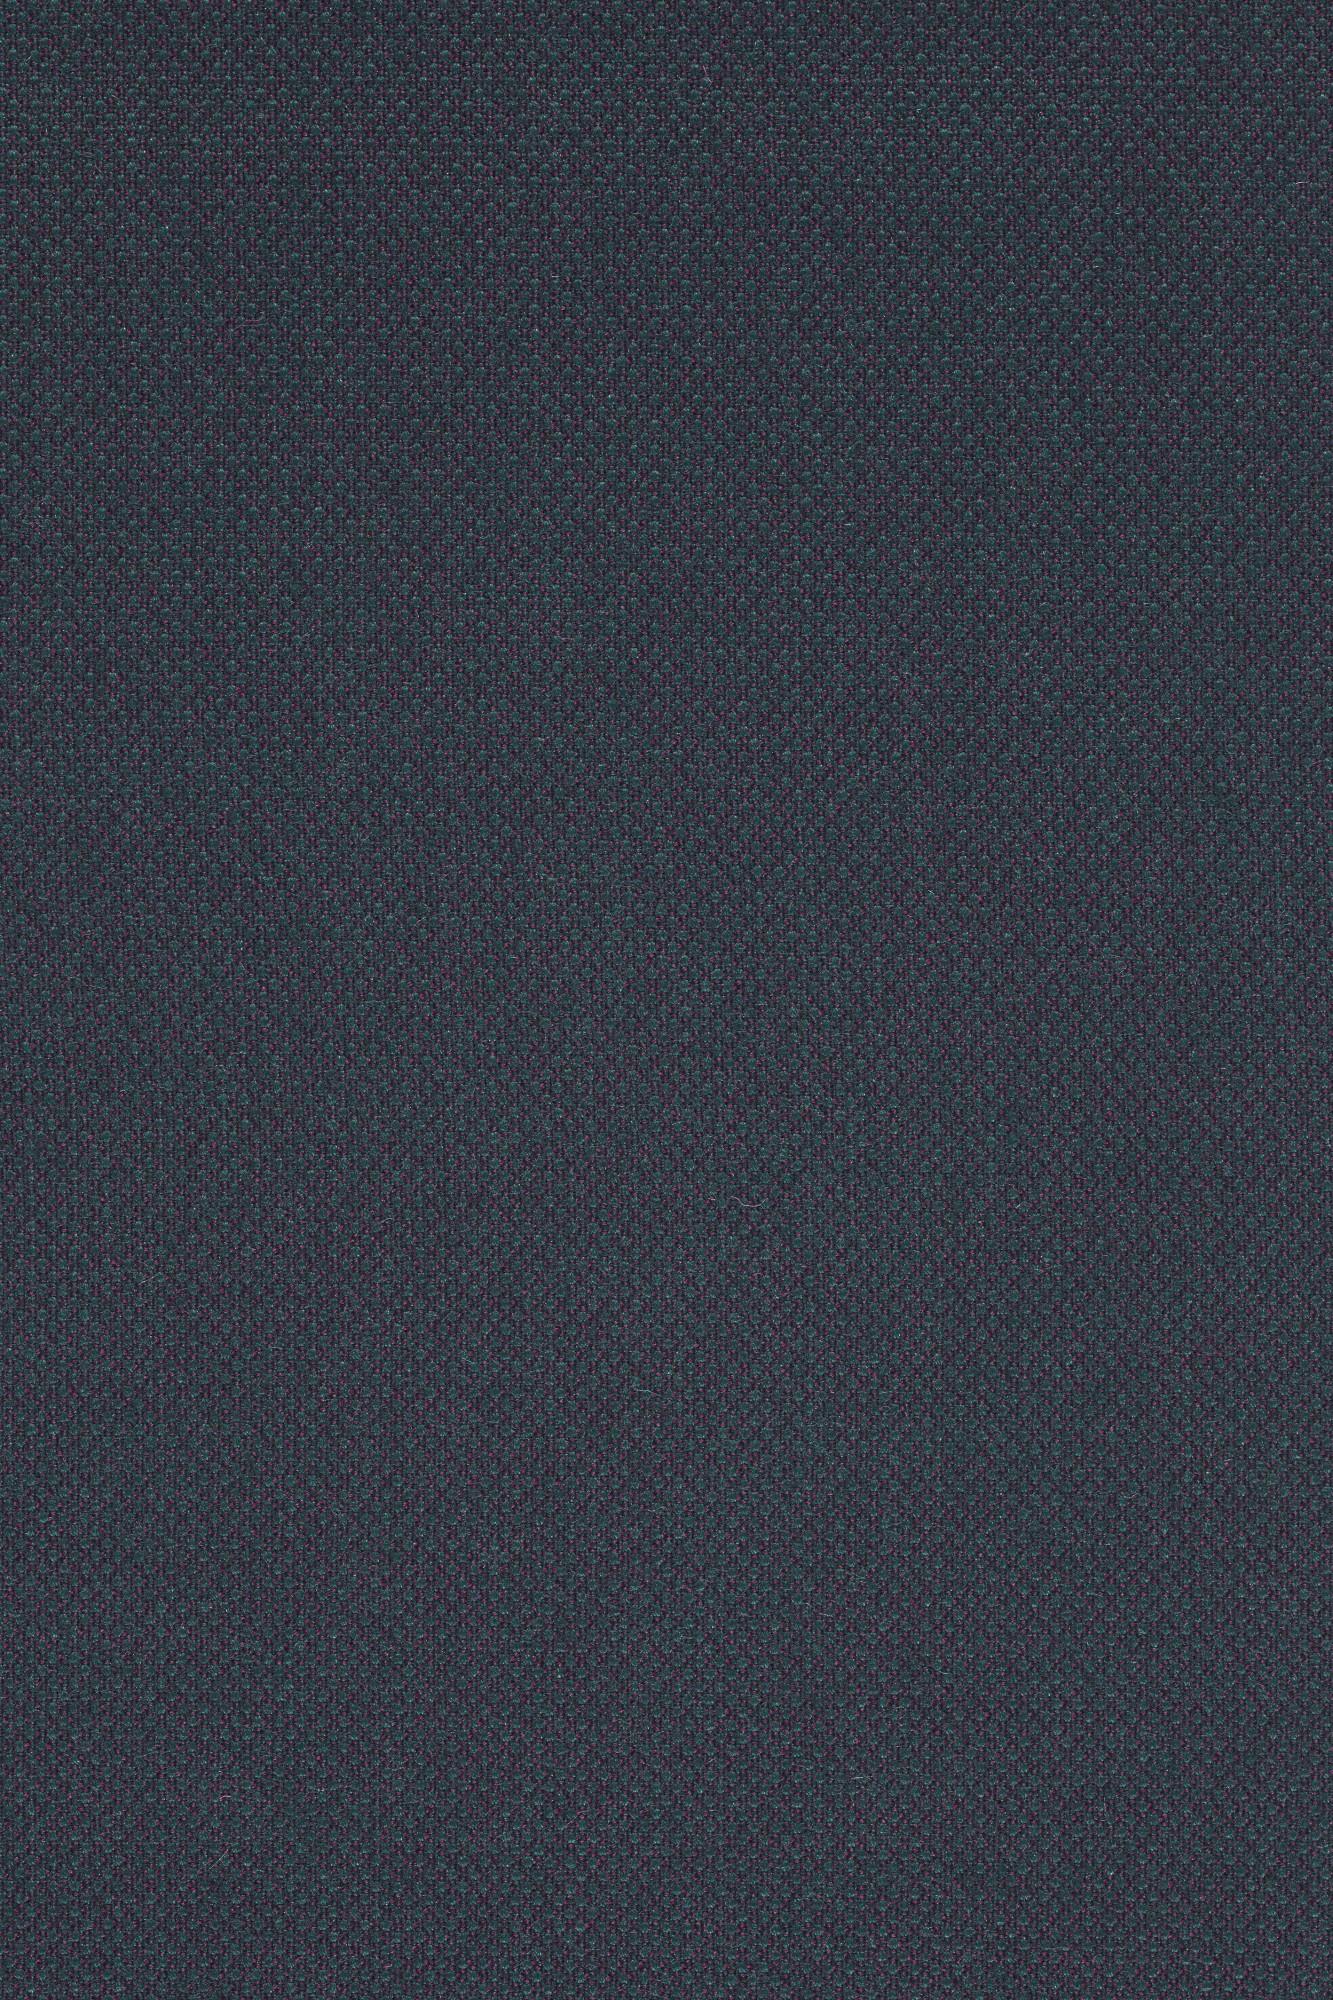 Fiord Fabric Kvadrat